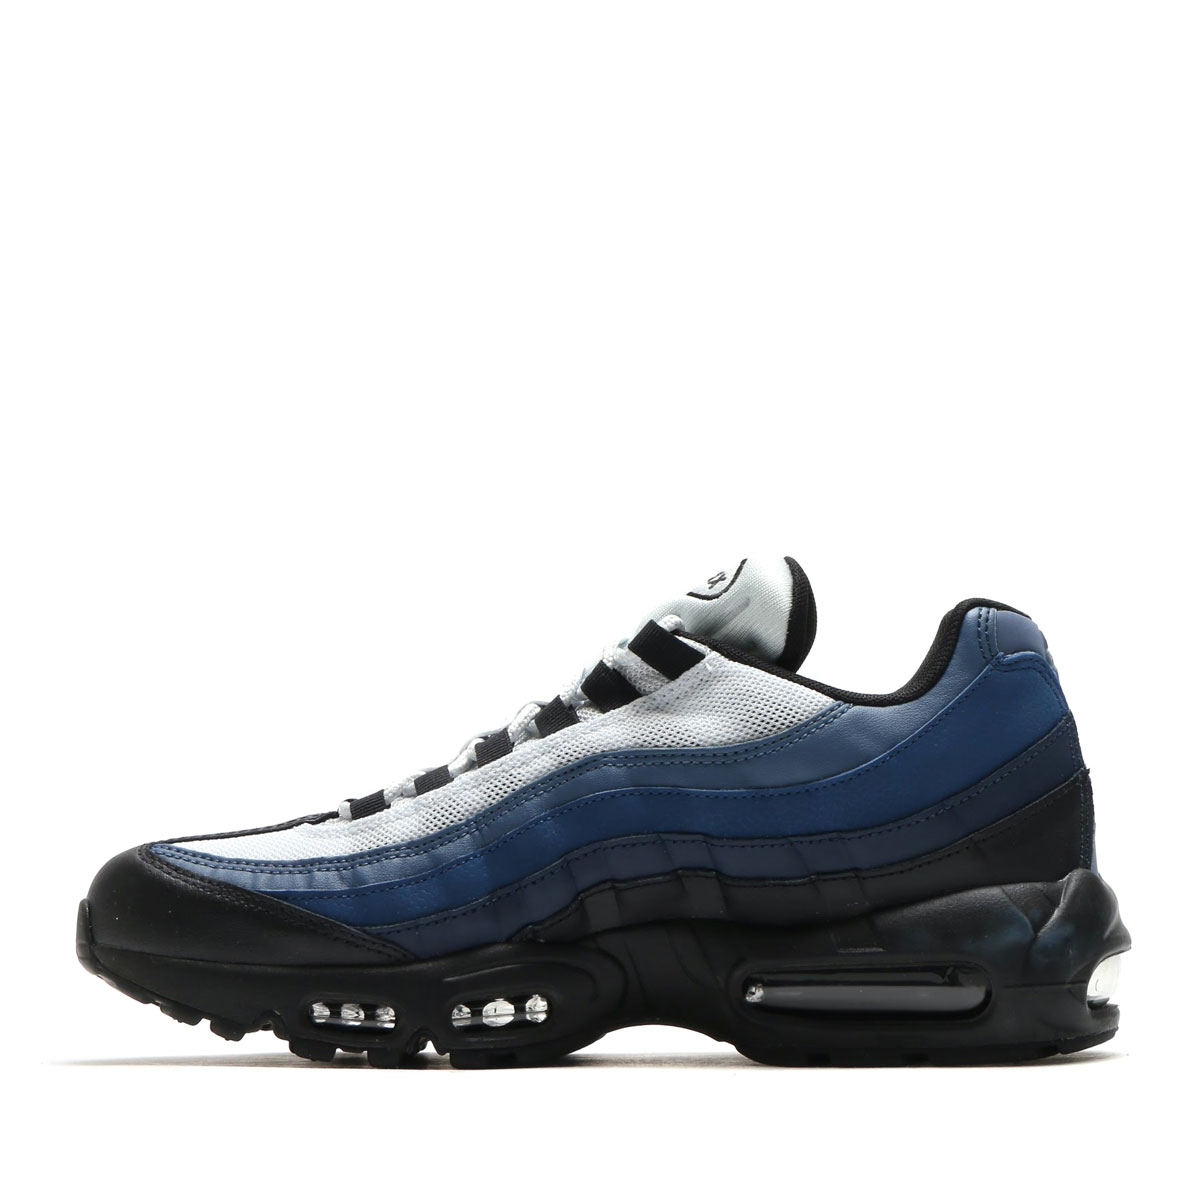 navy blue and grey air max 95 nz